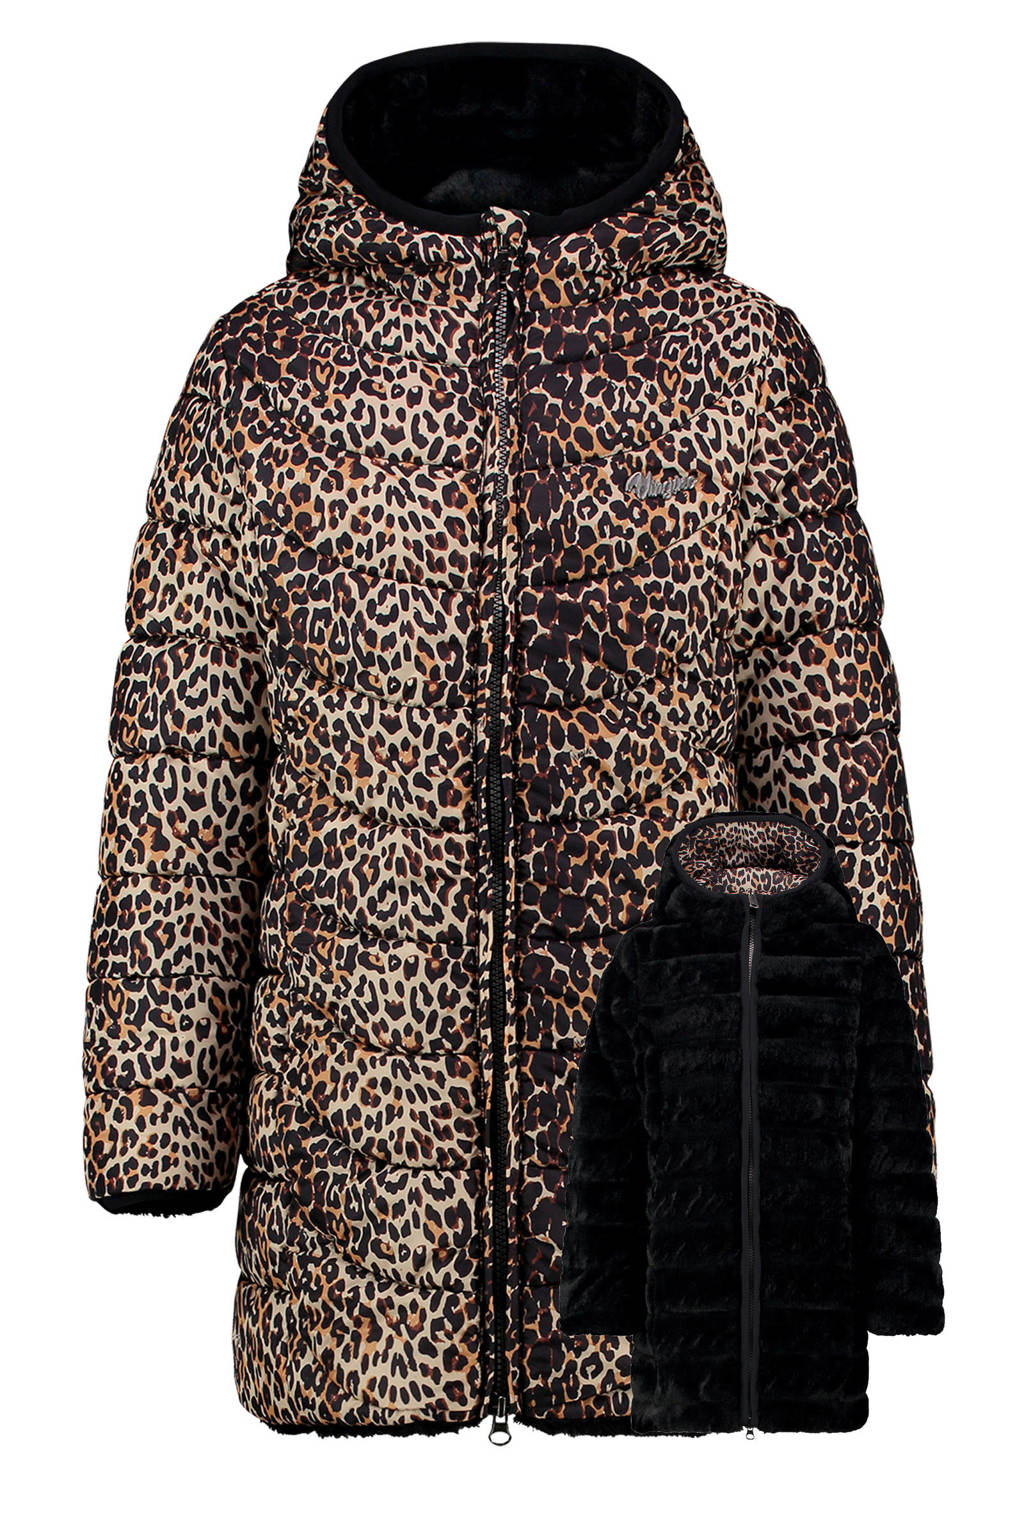 Vingino reversible gewatteerde winterjas Tilya met dierenprint zwart, Zwart